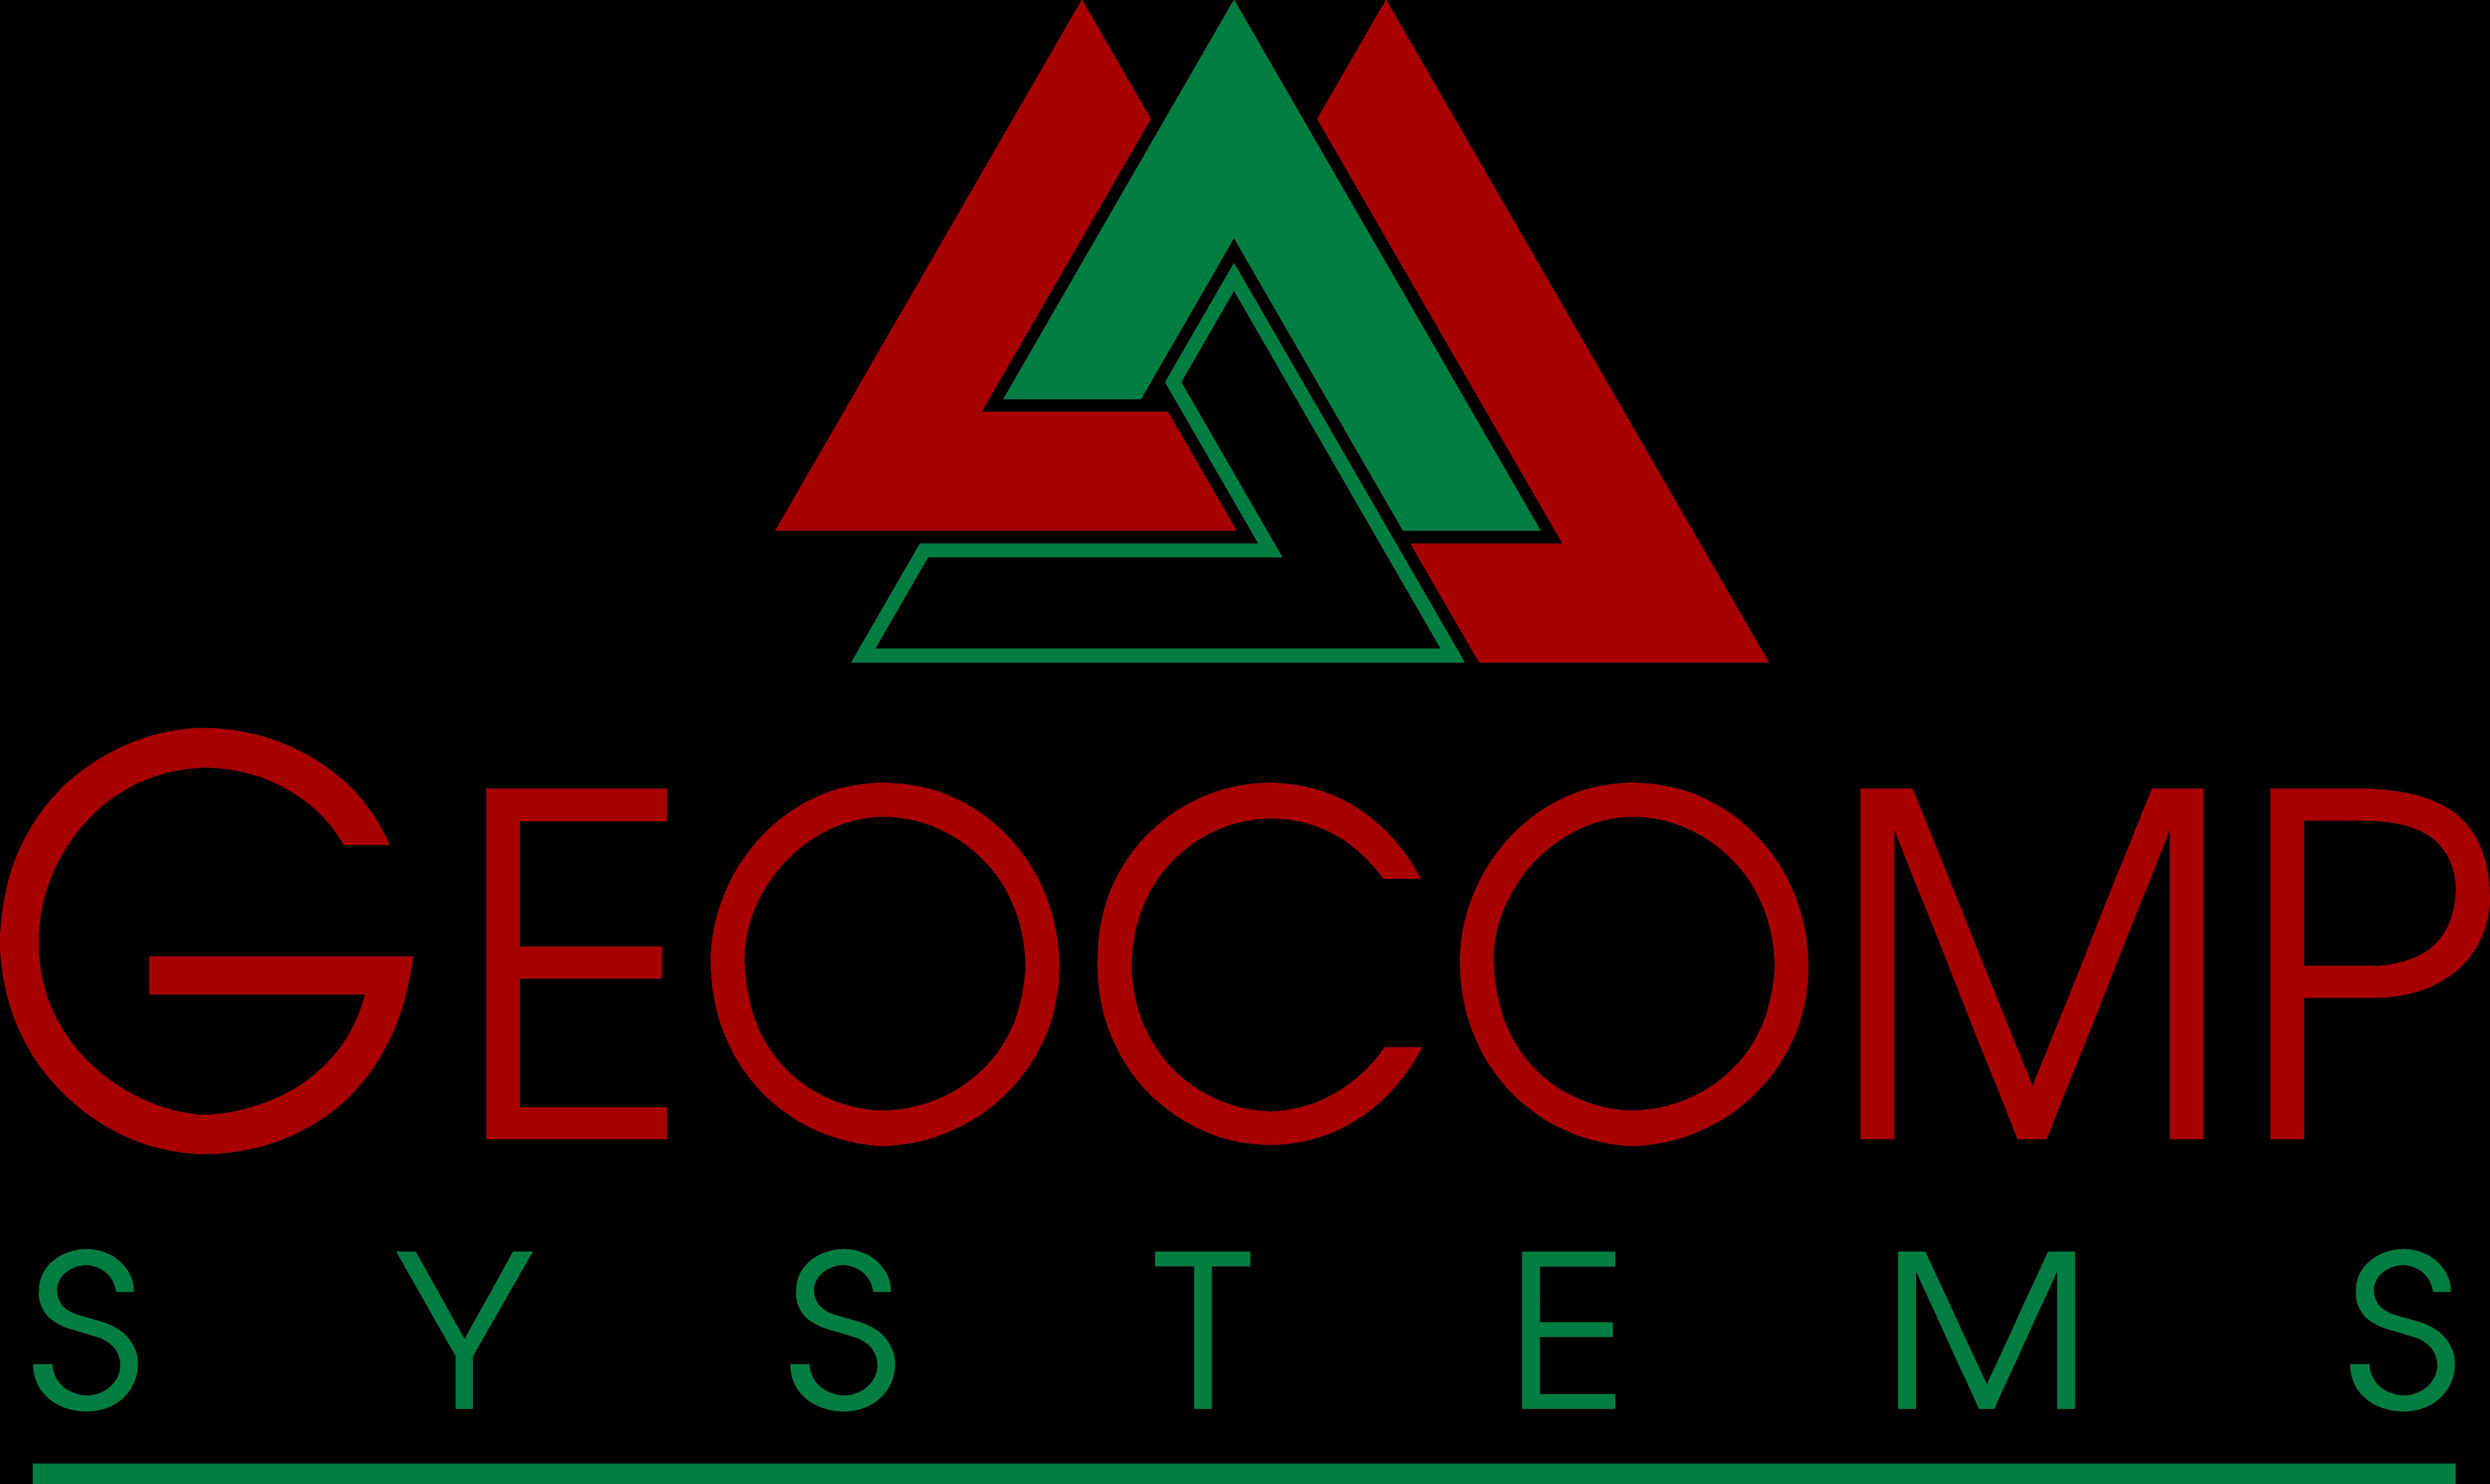 Geocomp Systems